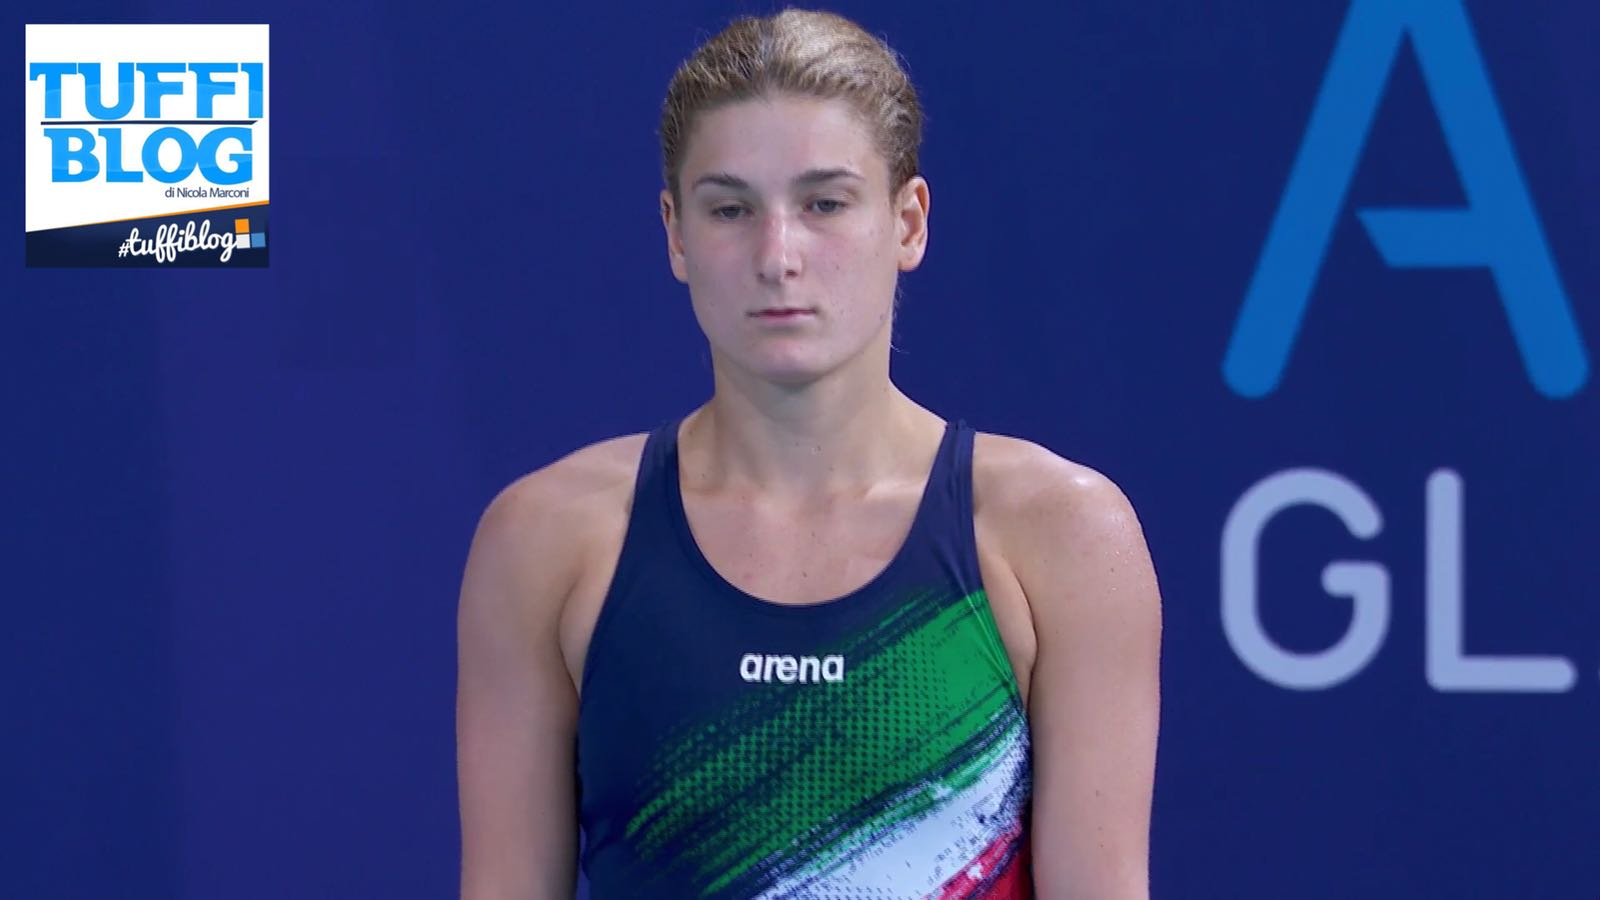 FINA Diving Grand Prix: Stati Uniti - due azzurre in finale, Pellacani e Bertocchi tra le migliori!